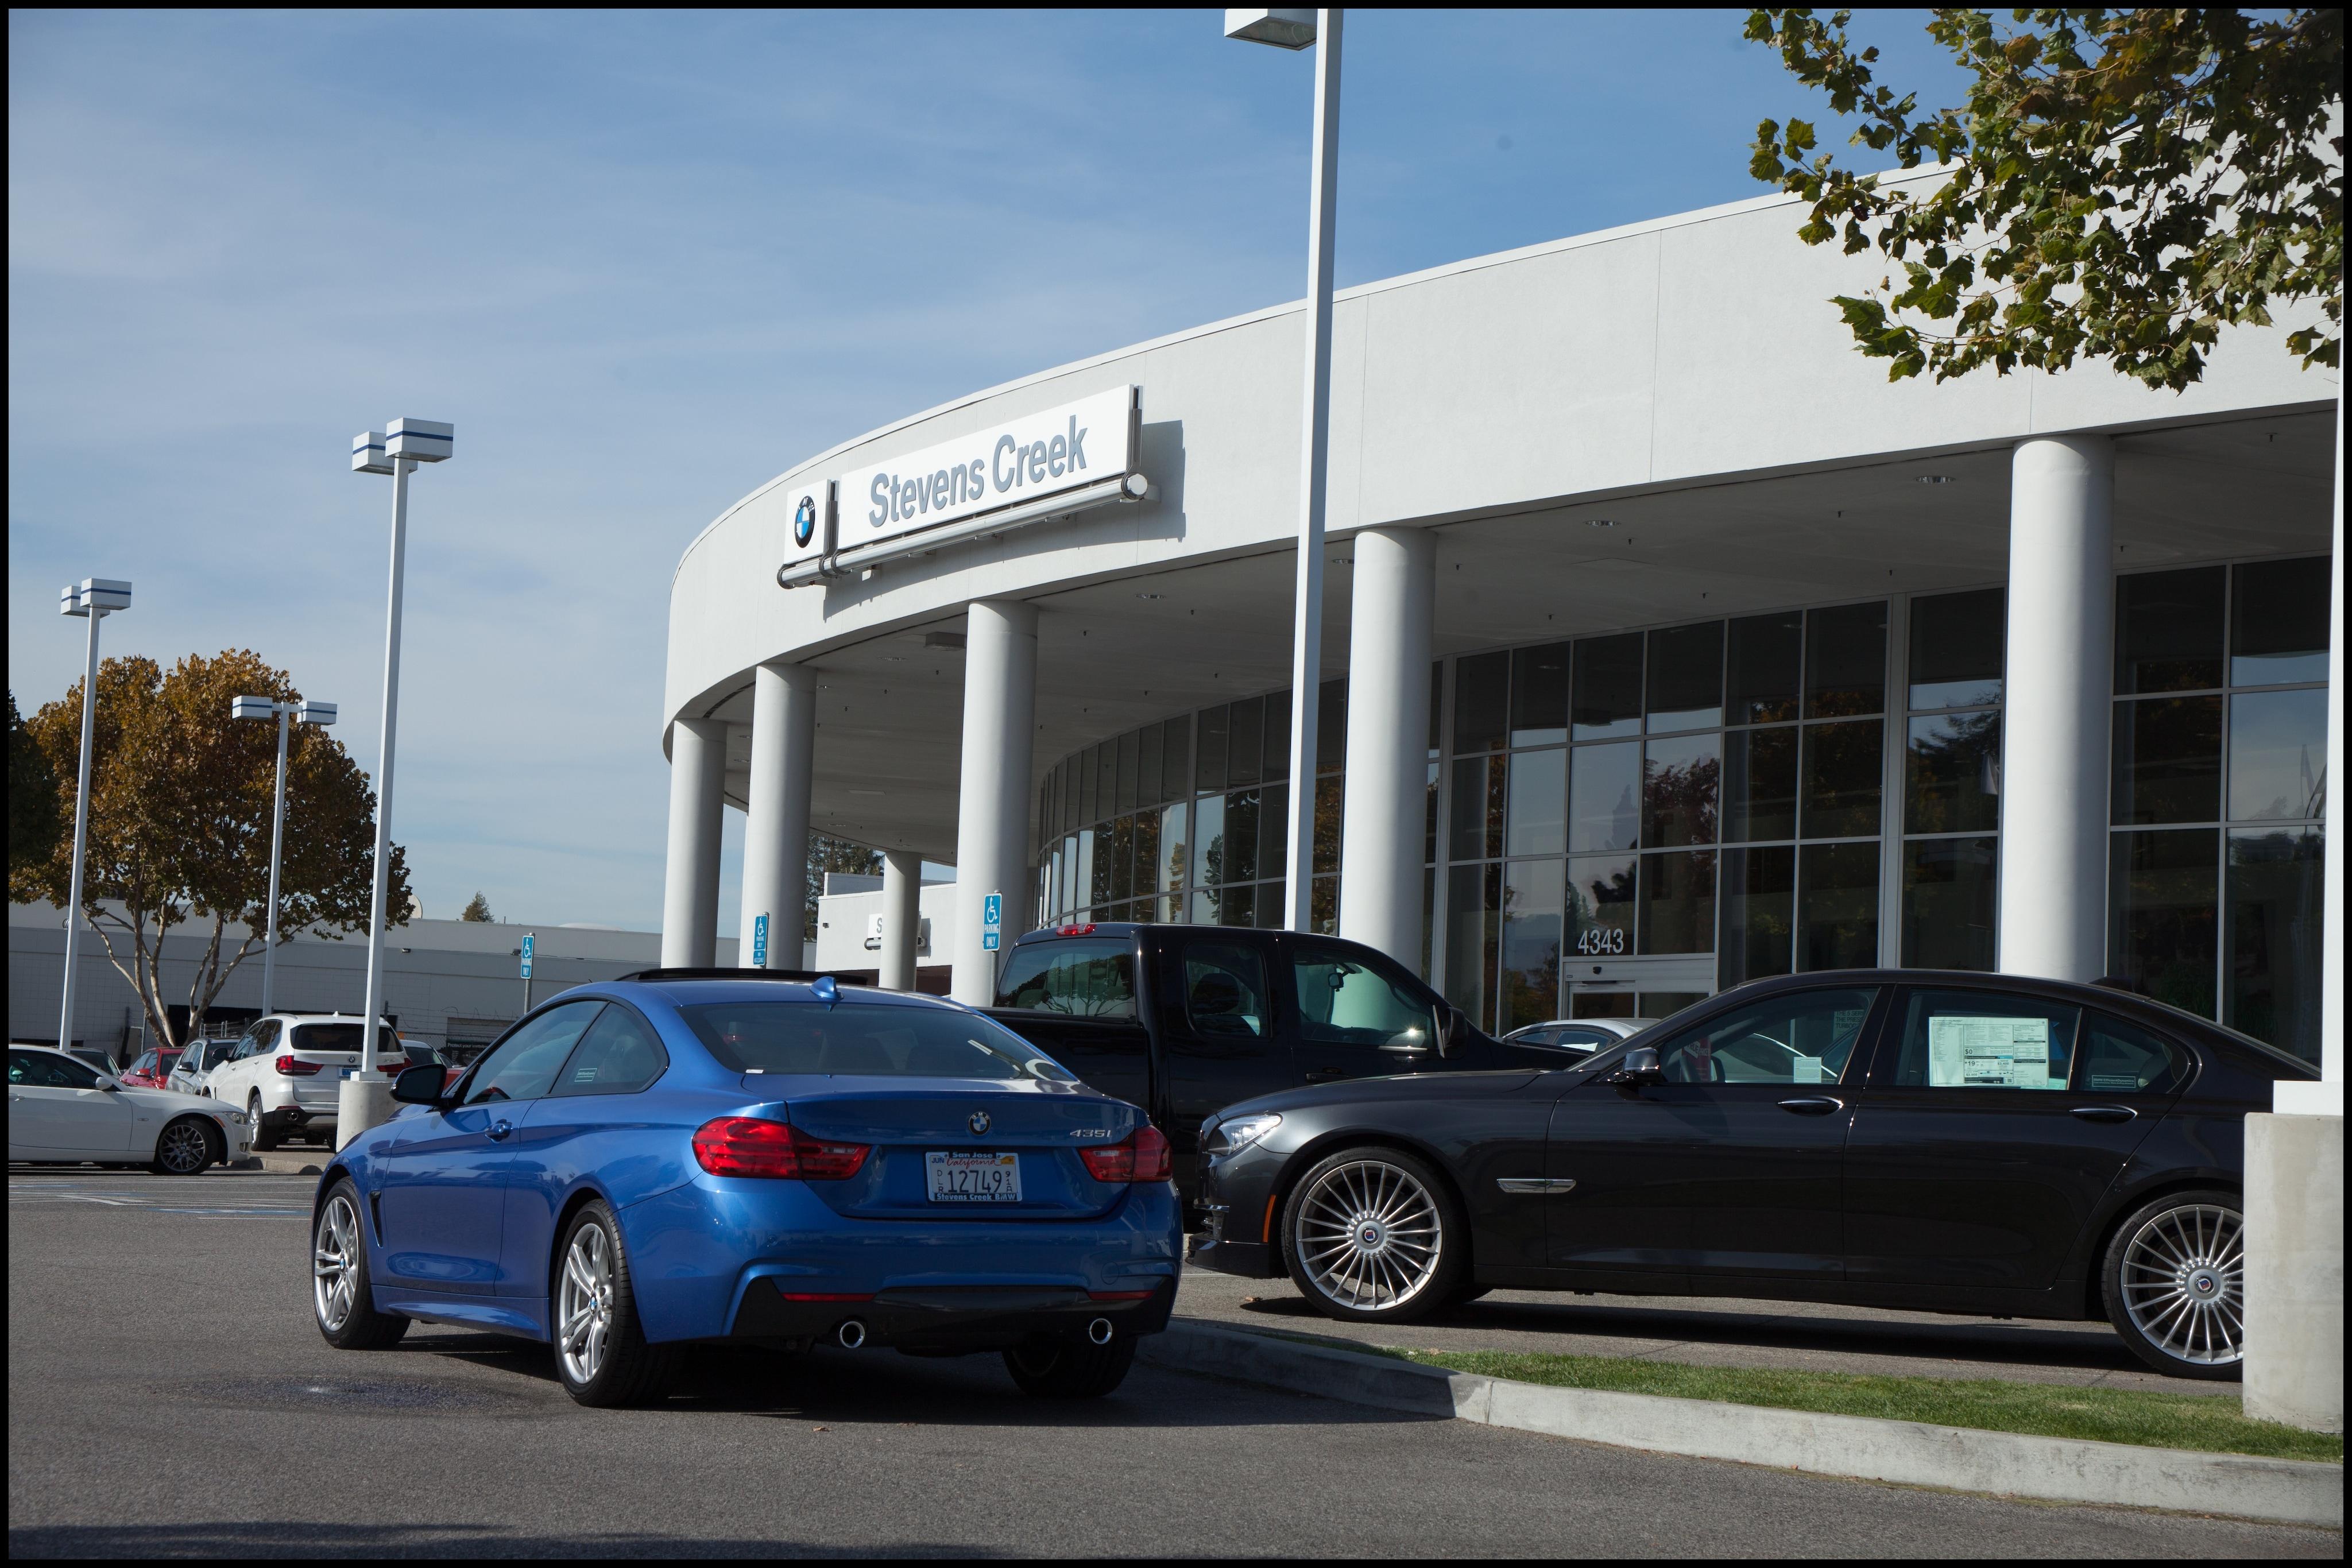 Bmw Fremont Service Bmw Auto Service Specials In Santa Clara Near Bay area & San Jose